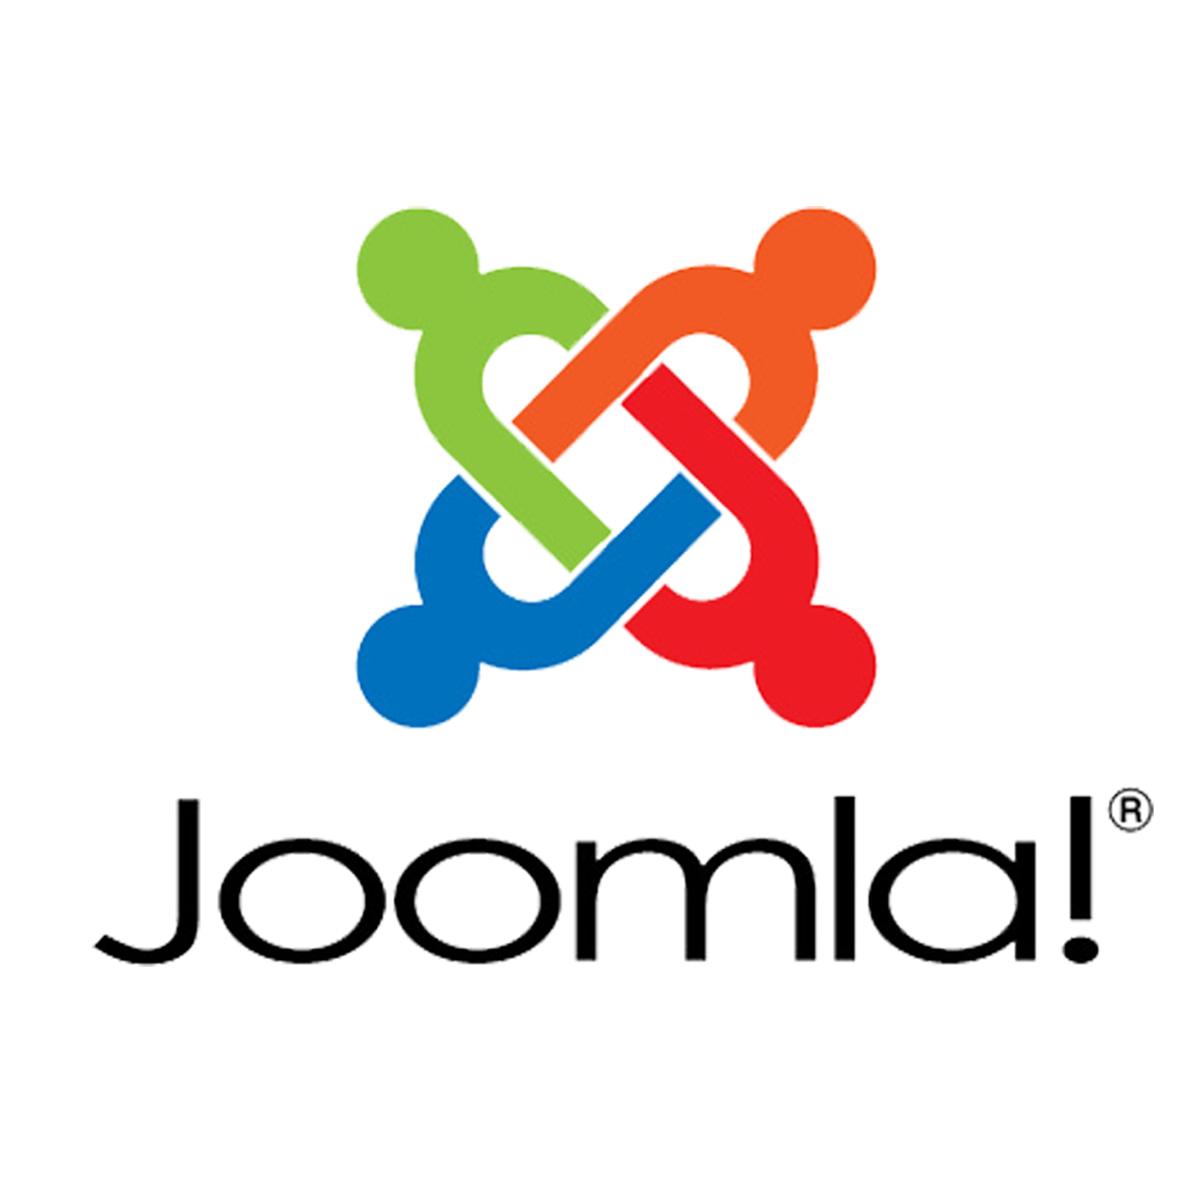 https://ml8bxbbz7pj9.i.optimole.com/kcjfi9Q.mVbO~6367f/w:auto/h:auto/q:90/https://arksstech.com/wp-content/upload/2018/06/jhoomla.png